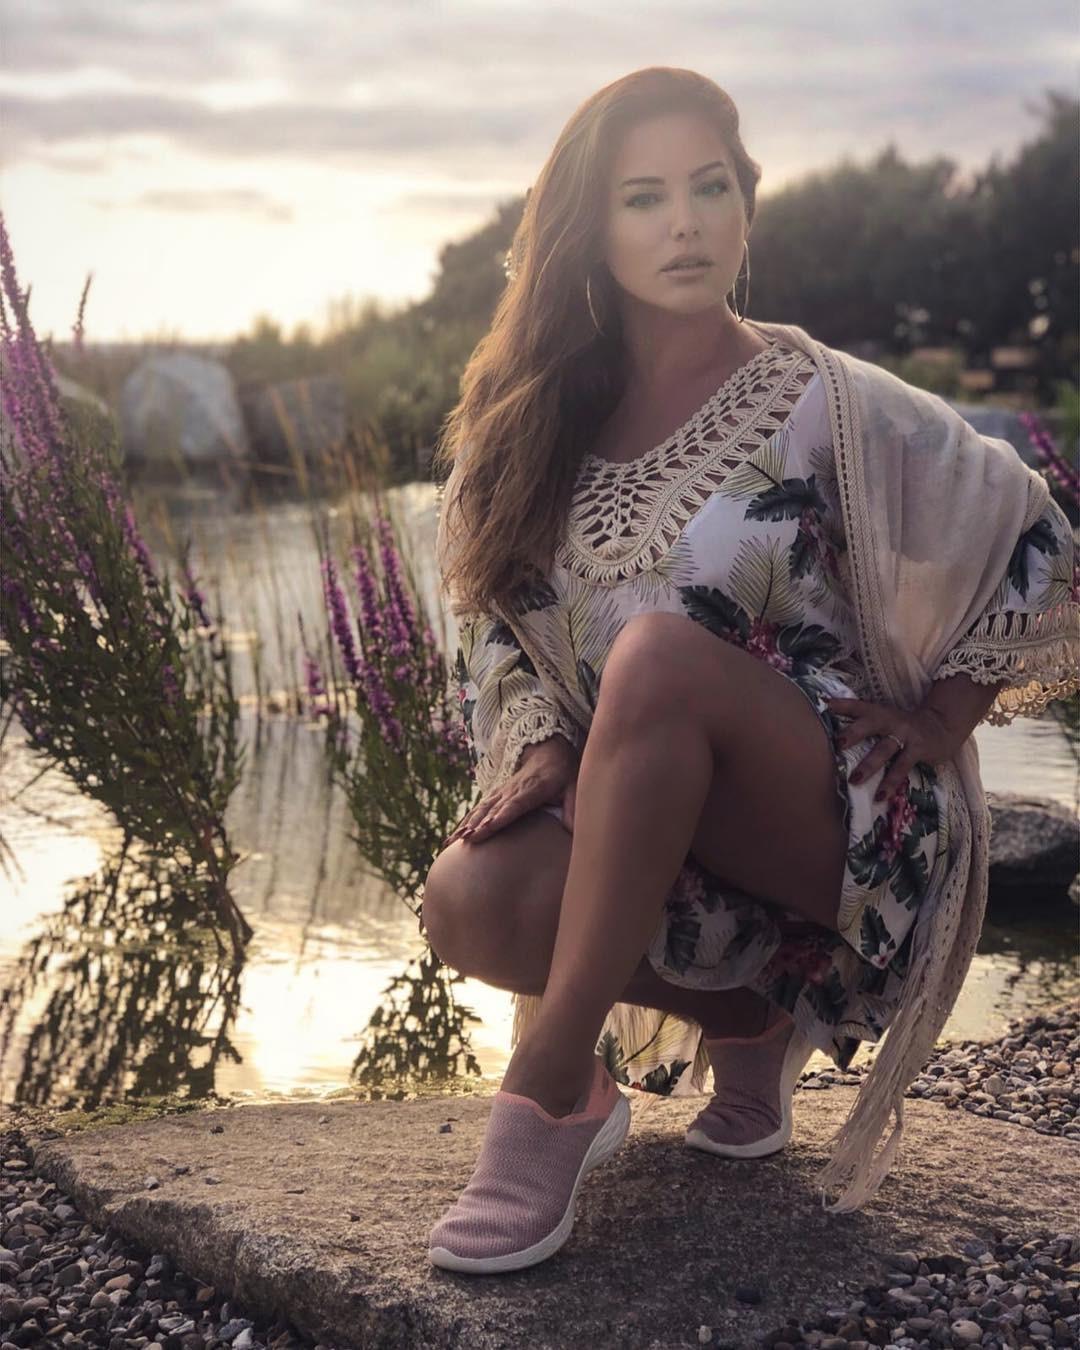 Kelly Brook Photoshoot Pics, Long Legs